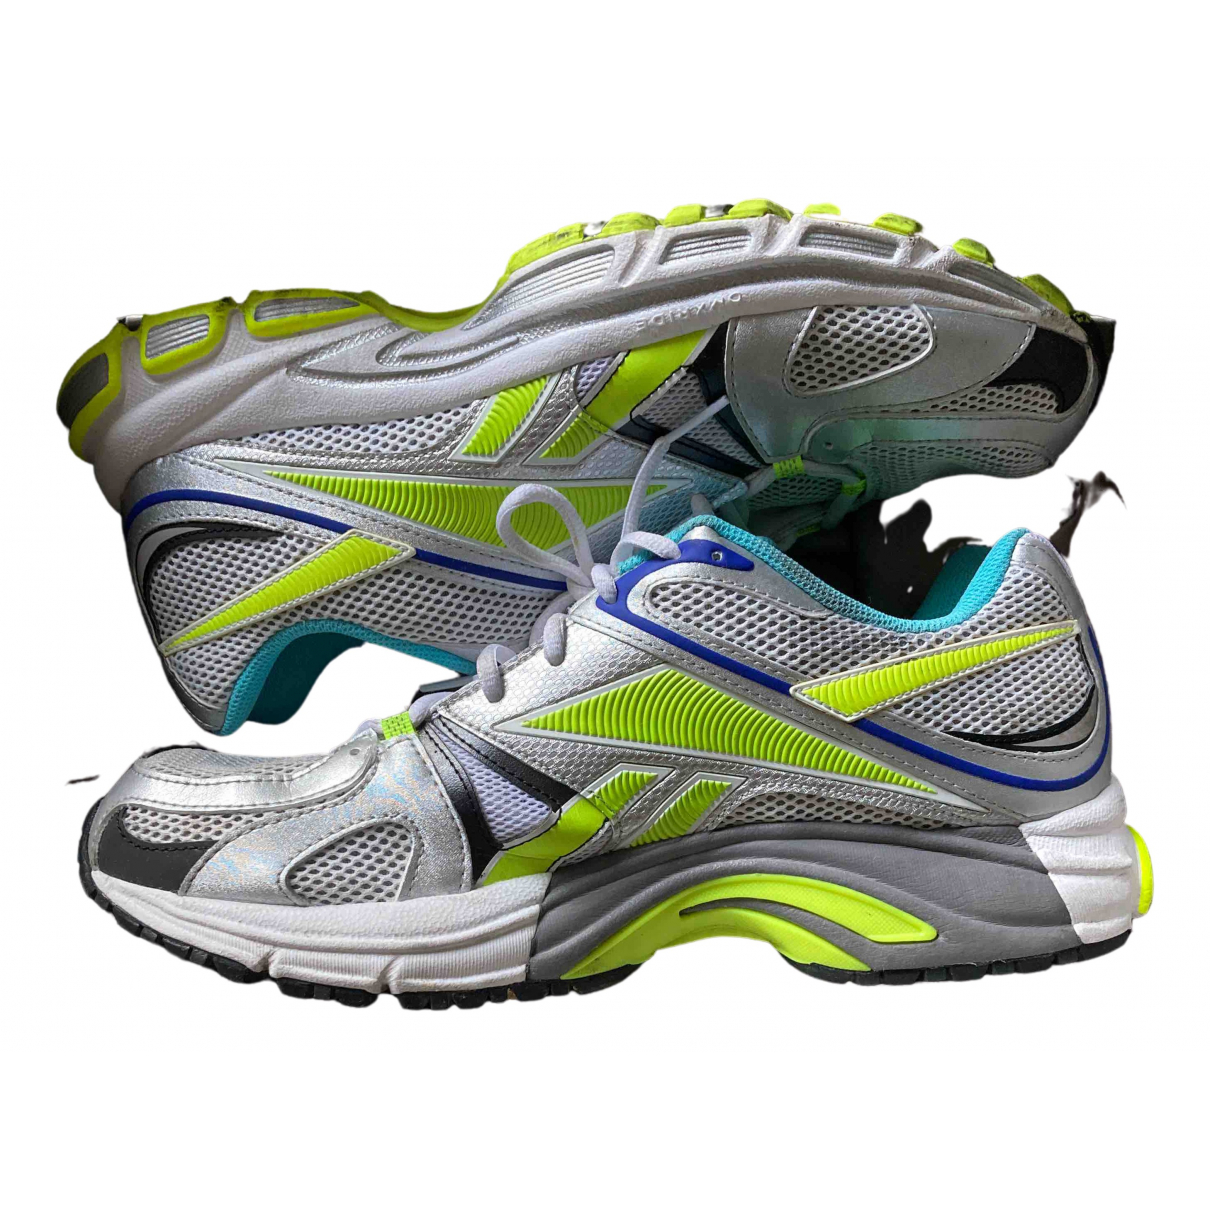 Reebok X Vetements \N Grey Trainers for Men 44.5 EU